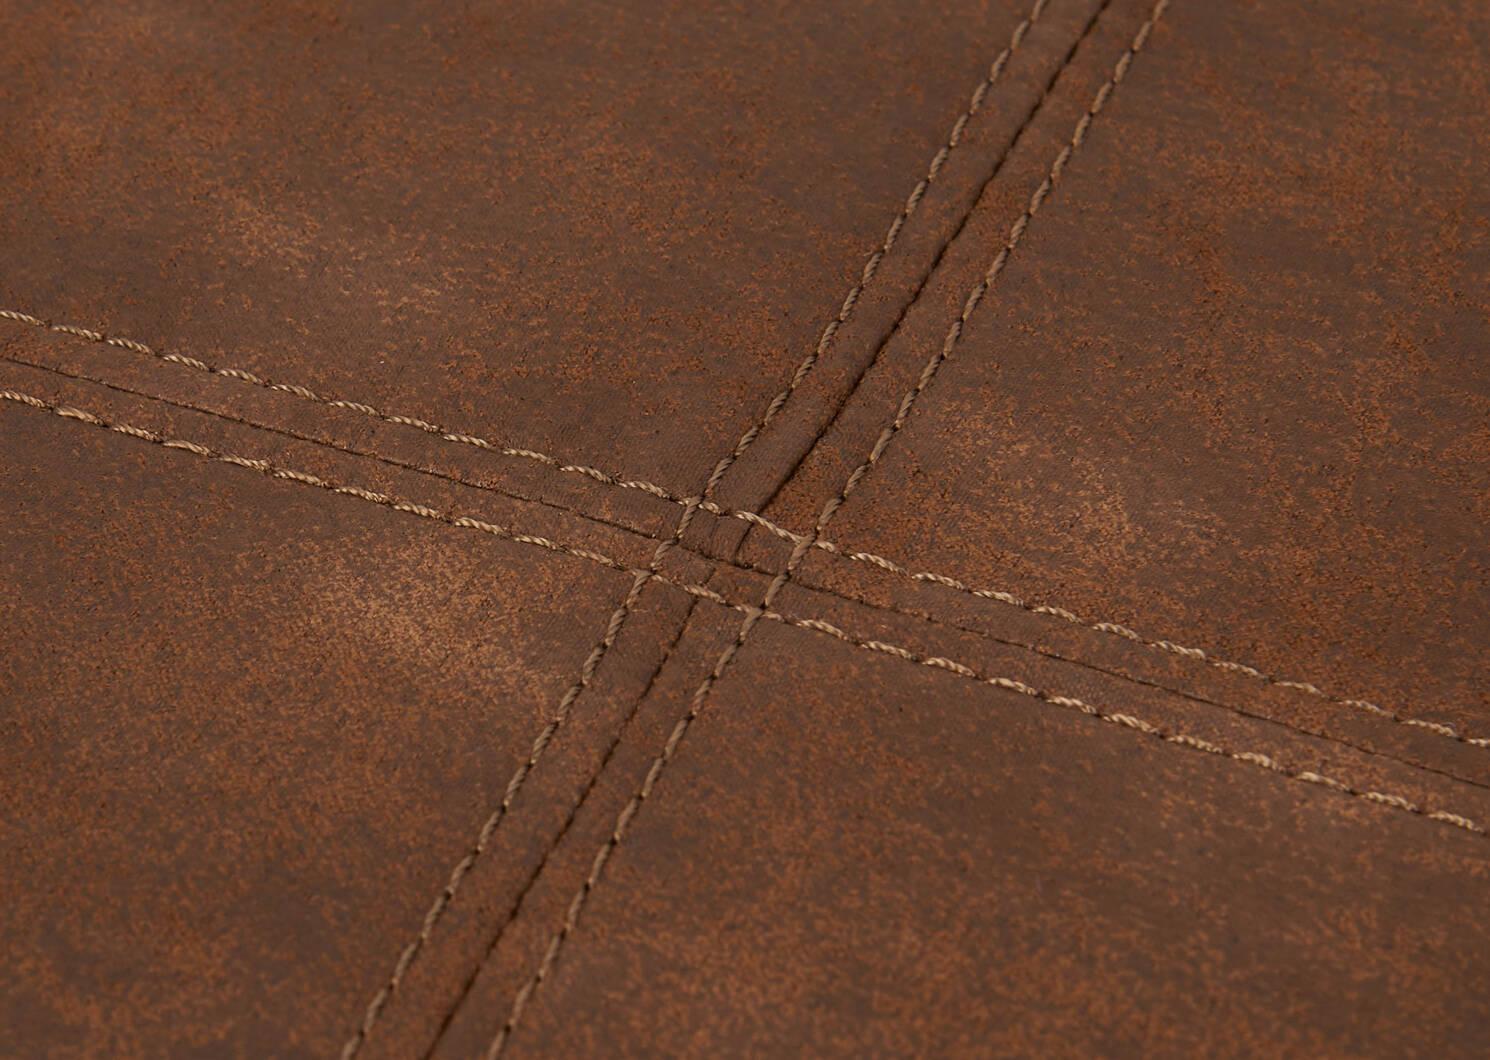 R-pieds carré Tarek -Pierre brun clair